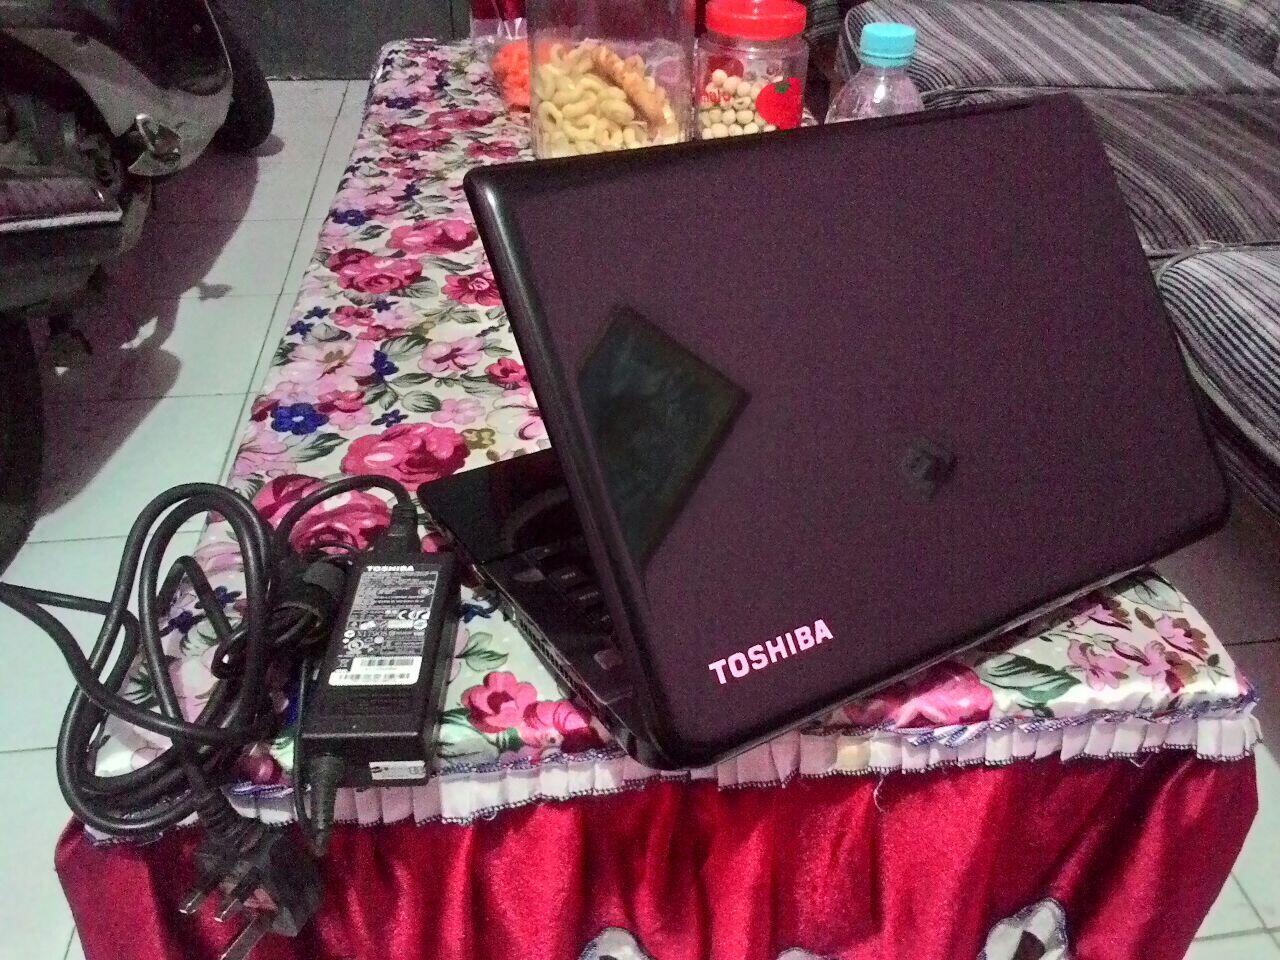 TOSHIBA C40-A | i3 IVYYBRIDGE | HD 500GB di MALANG